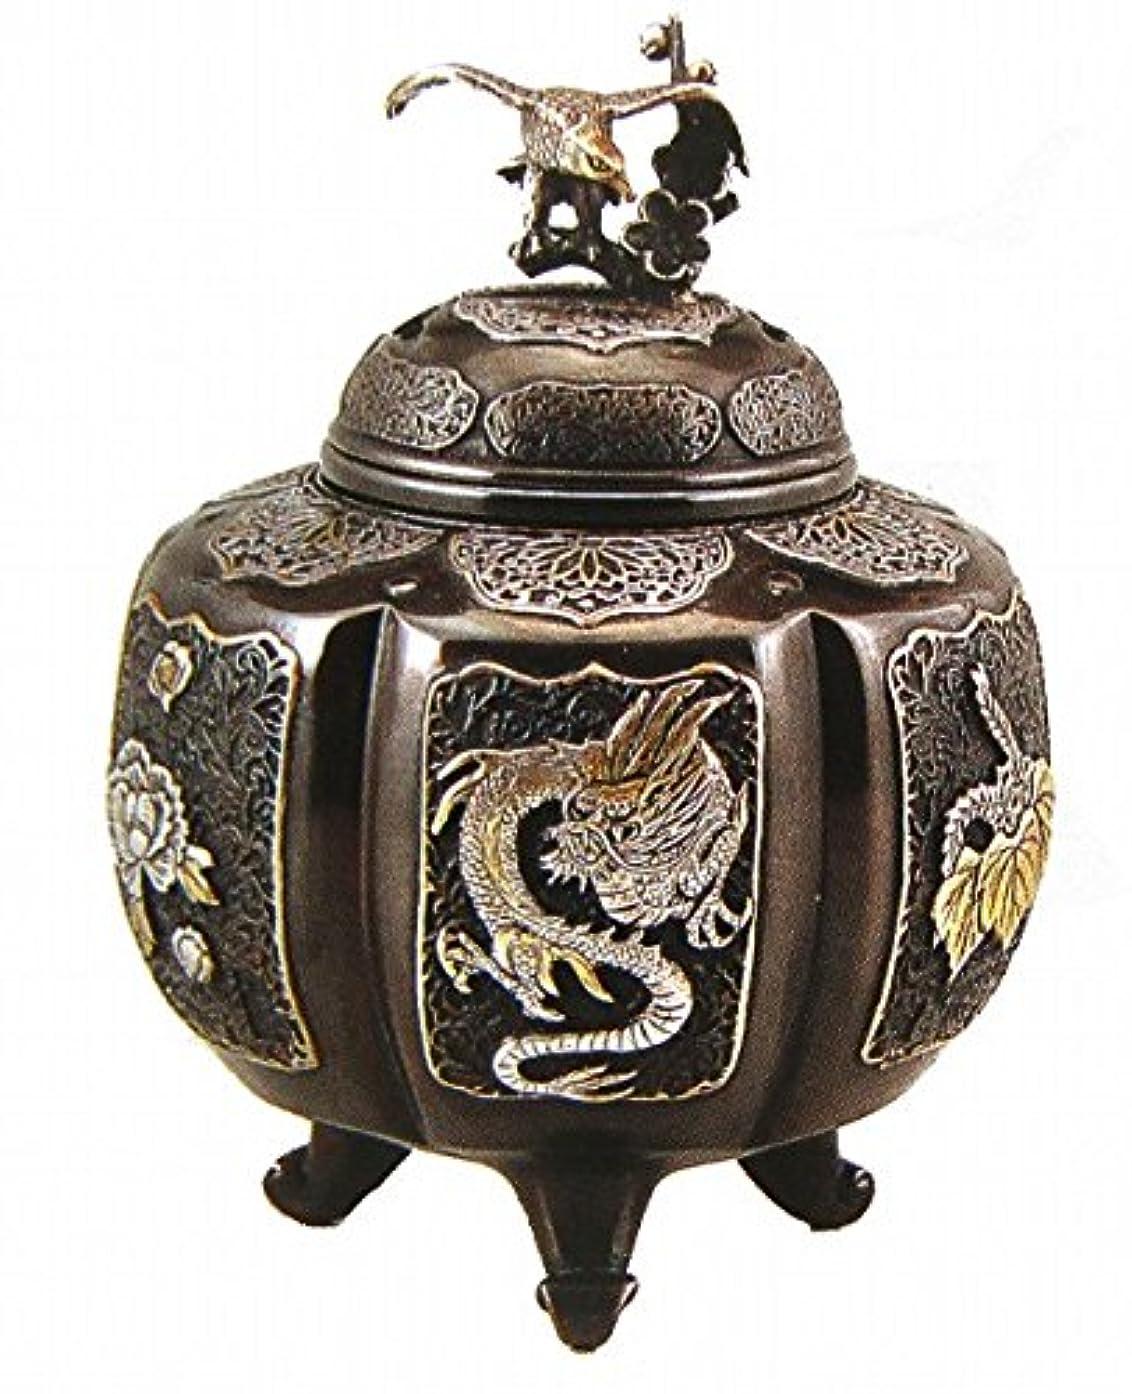 観光遅滞キラウエア山『六面吉祥地紋香炉』銅製